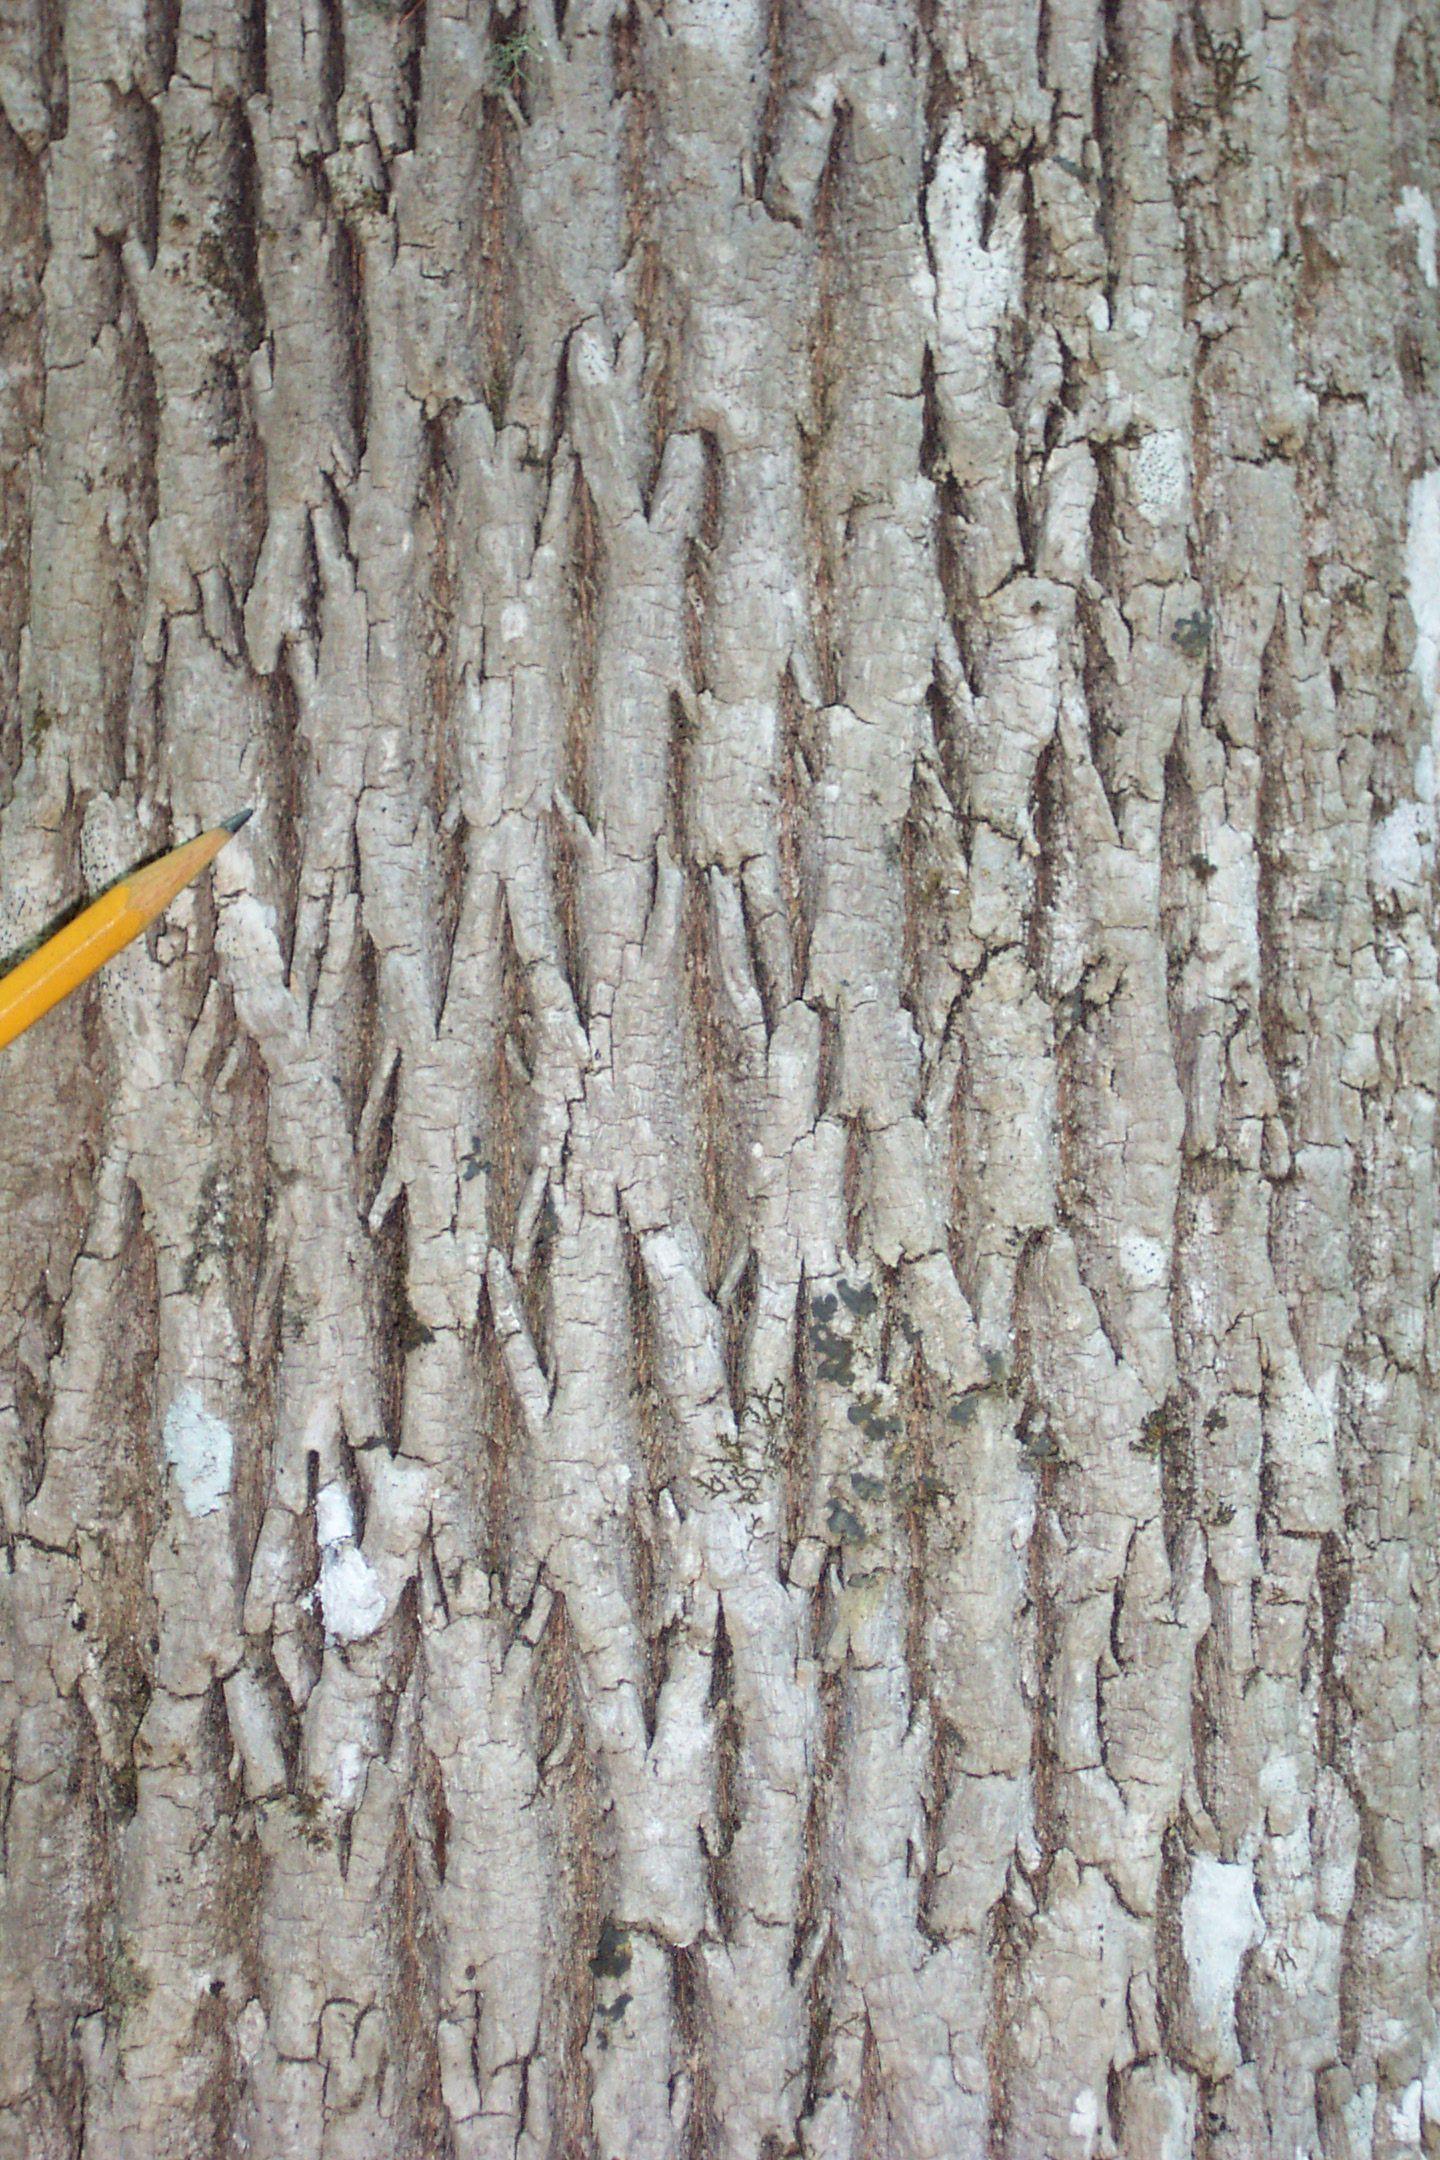 fraxinus spp. bark - Google Search